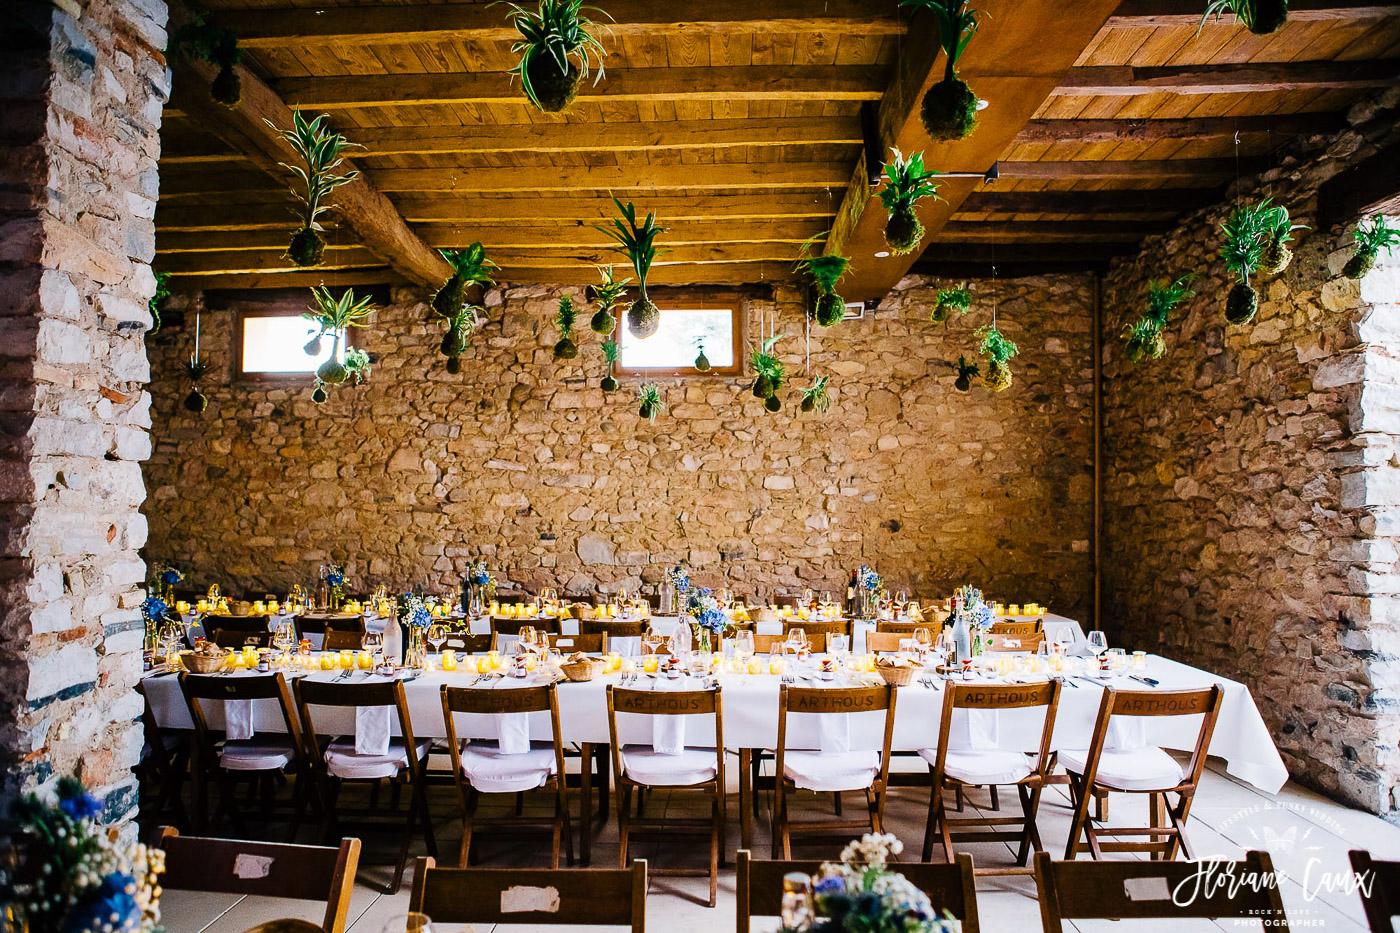 photographe-mariage-pays-basque-Floriane-Caux (5b)